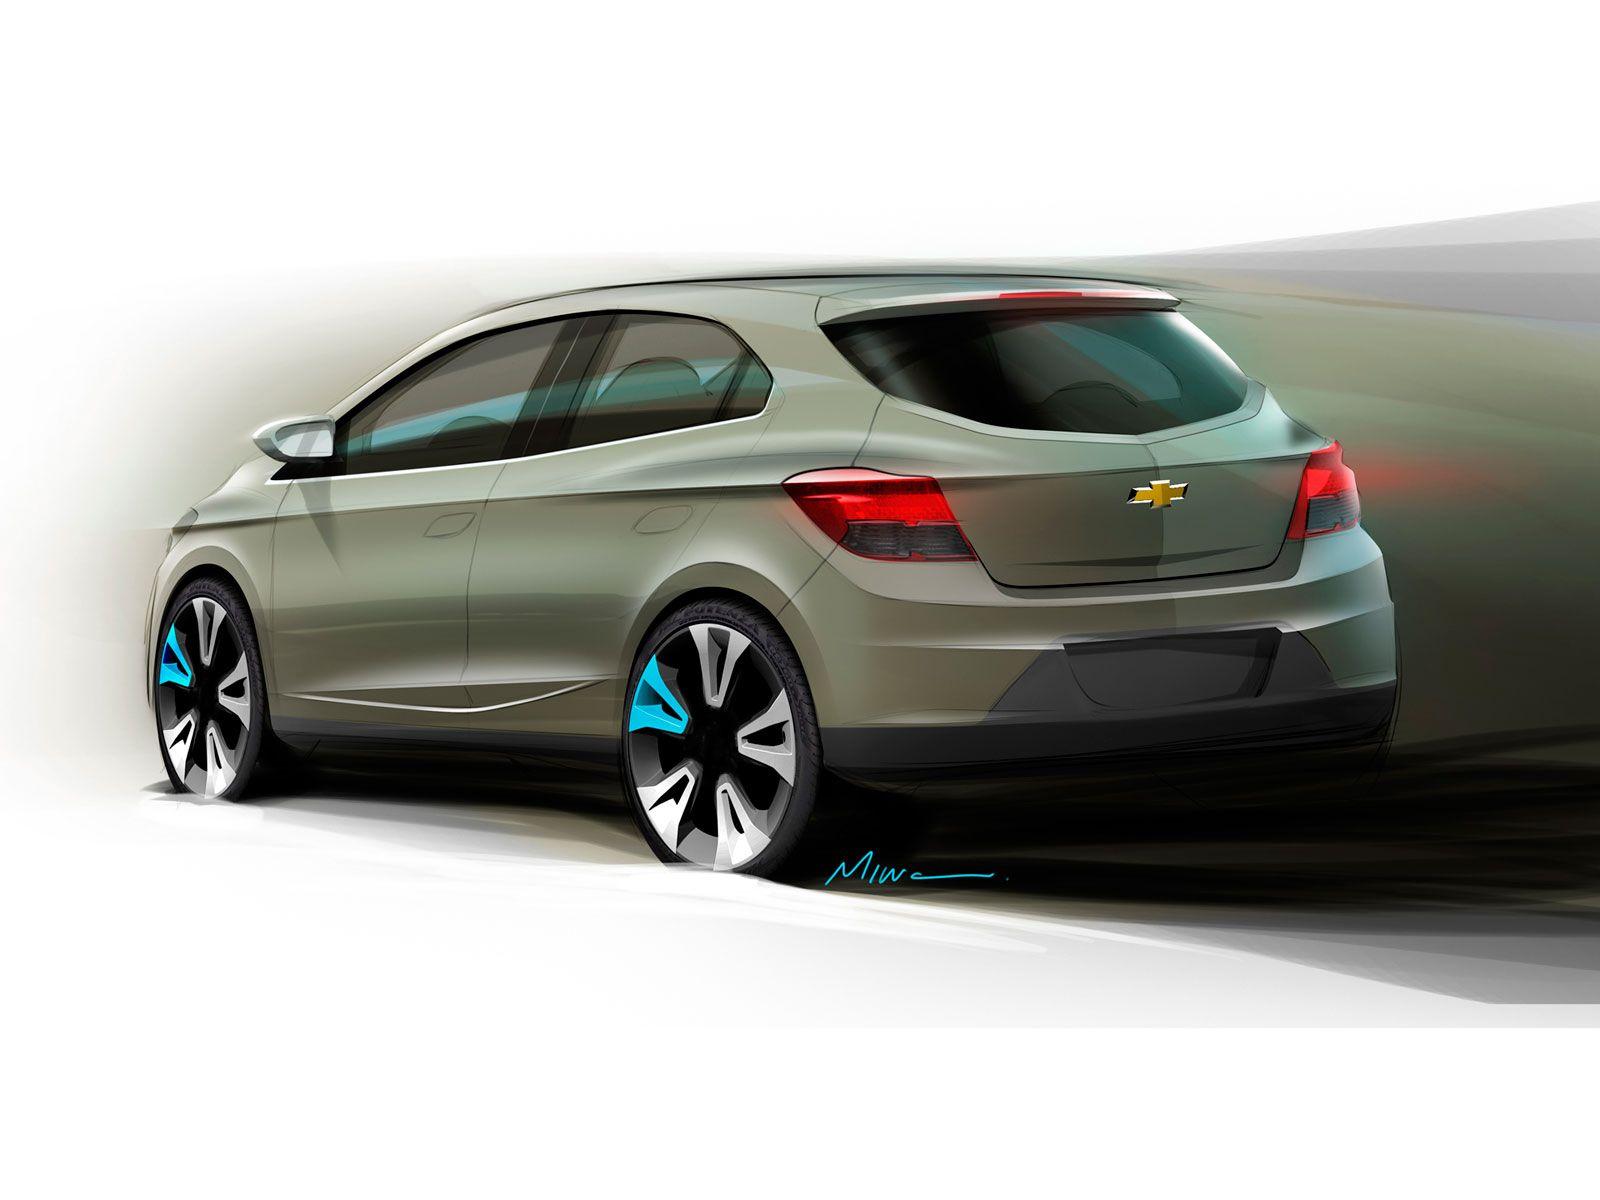 Chevrolet Onix Design Sketch Chevrolet Car Sketch Concept Cars